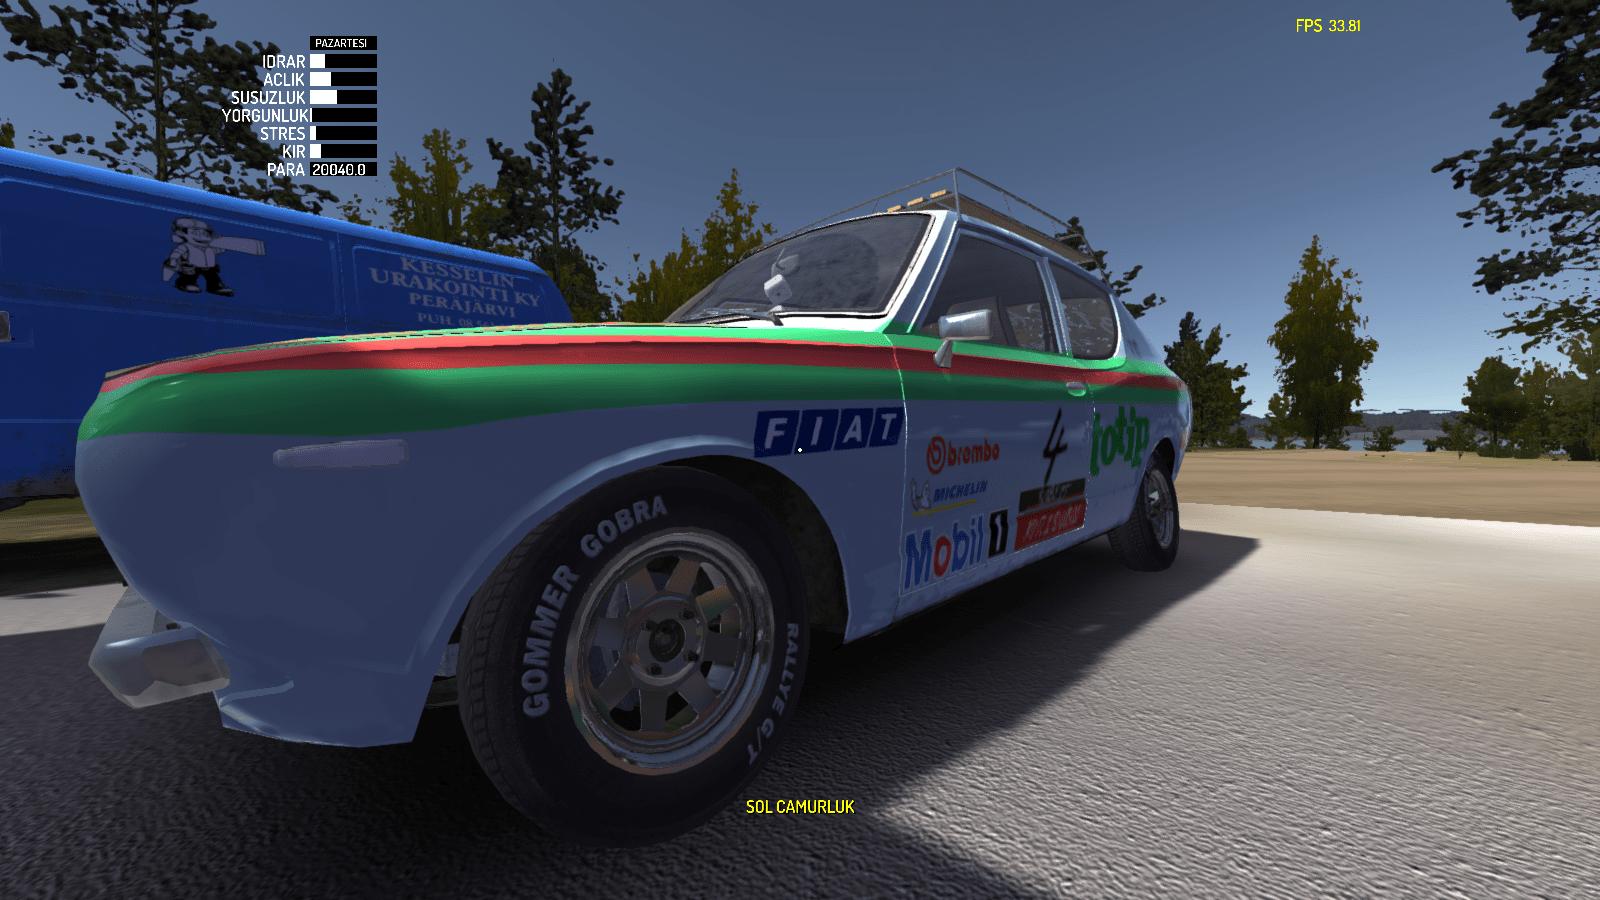 My Summer Car Race Skin Racedepartment